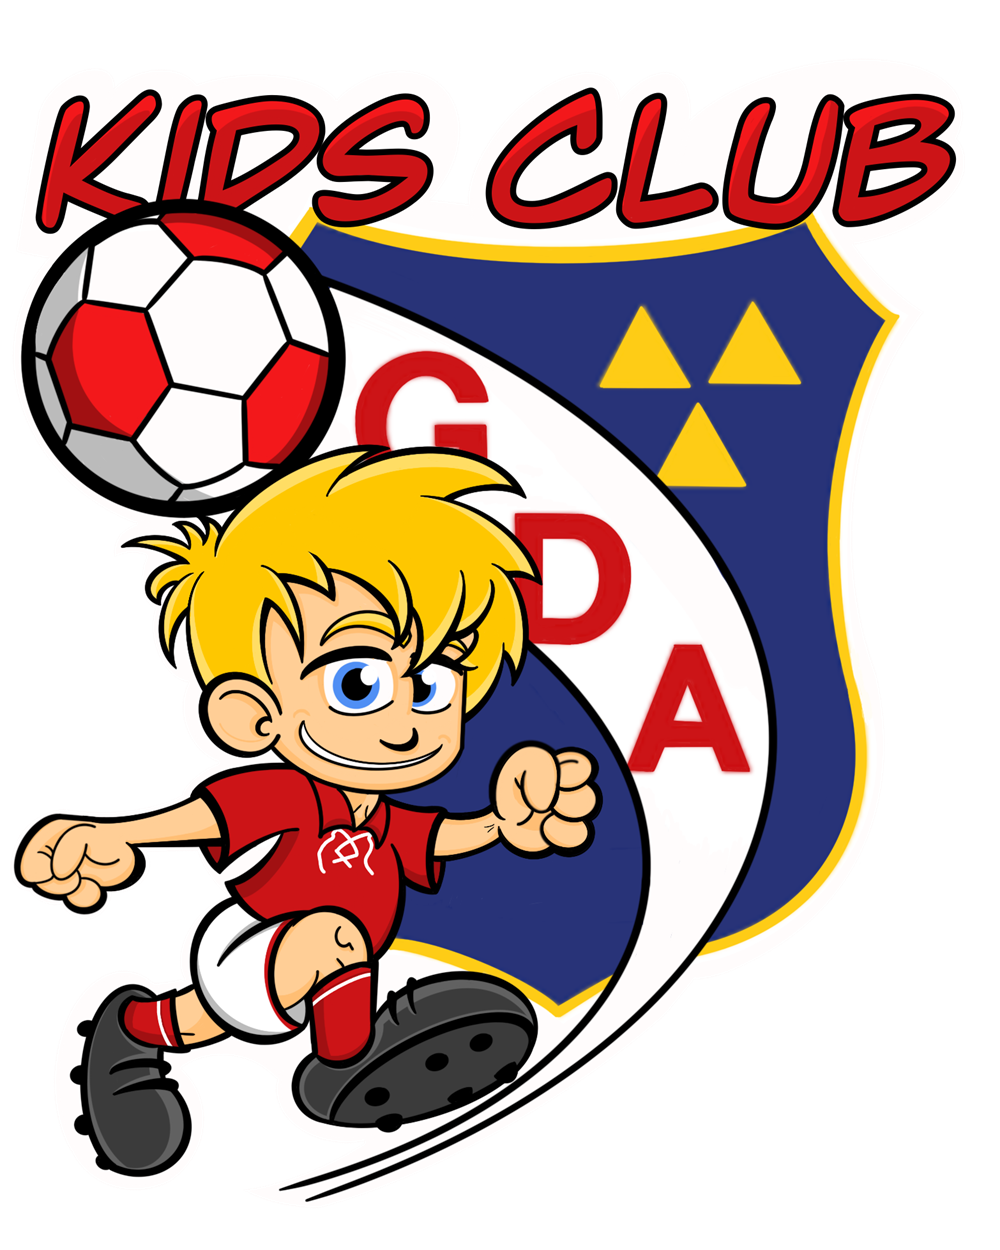 KIDS_CLUB_LOGO.png